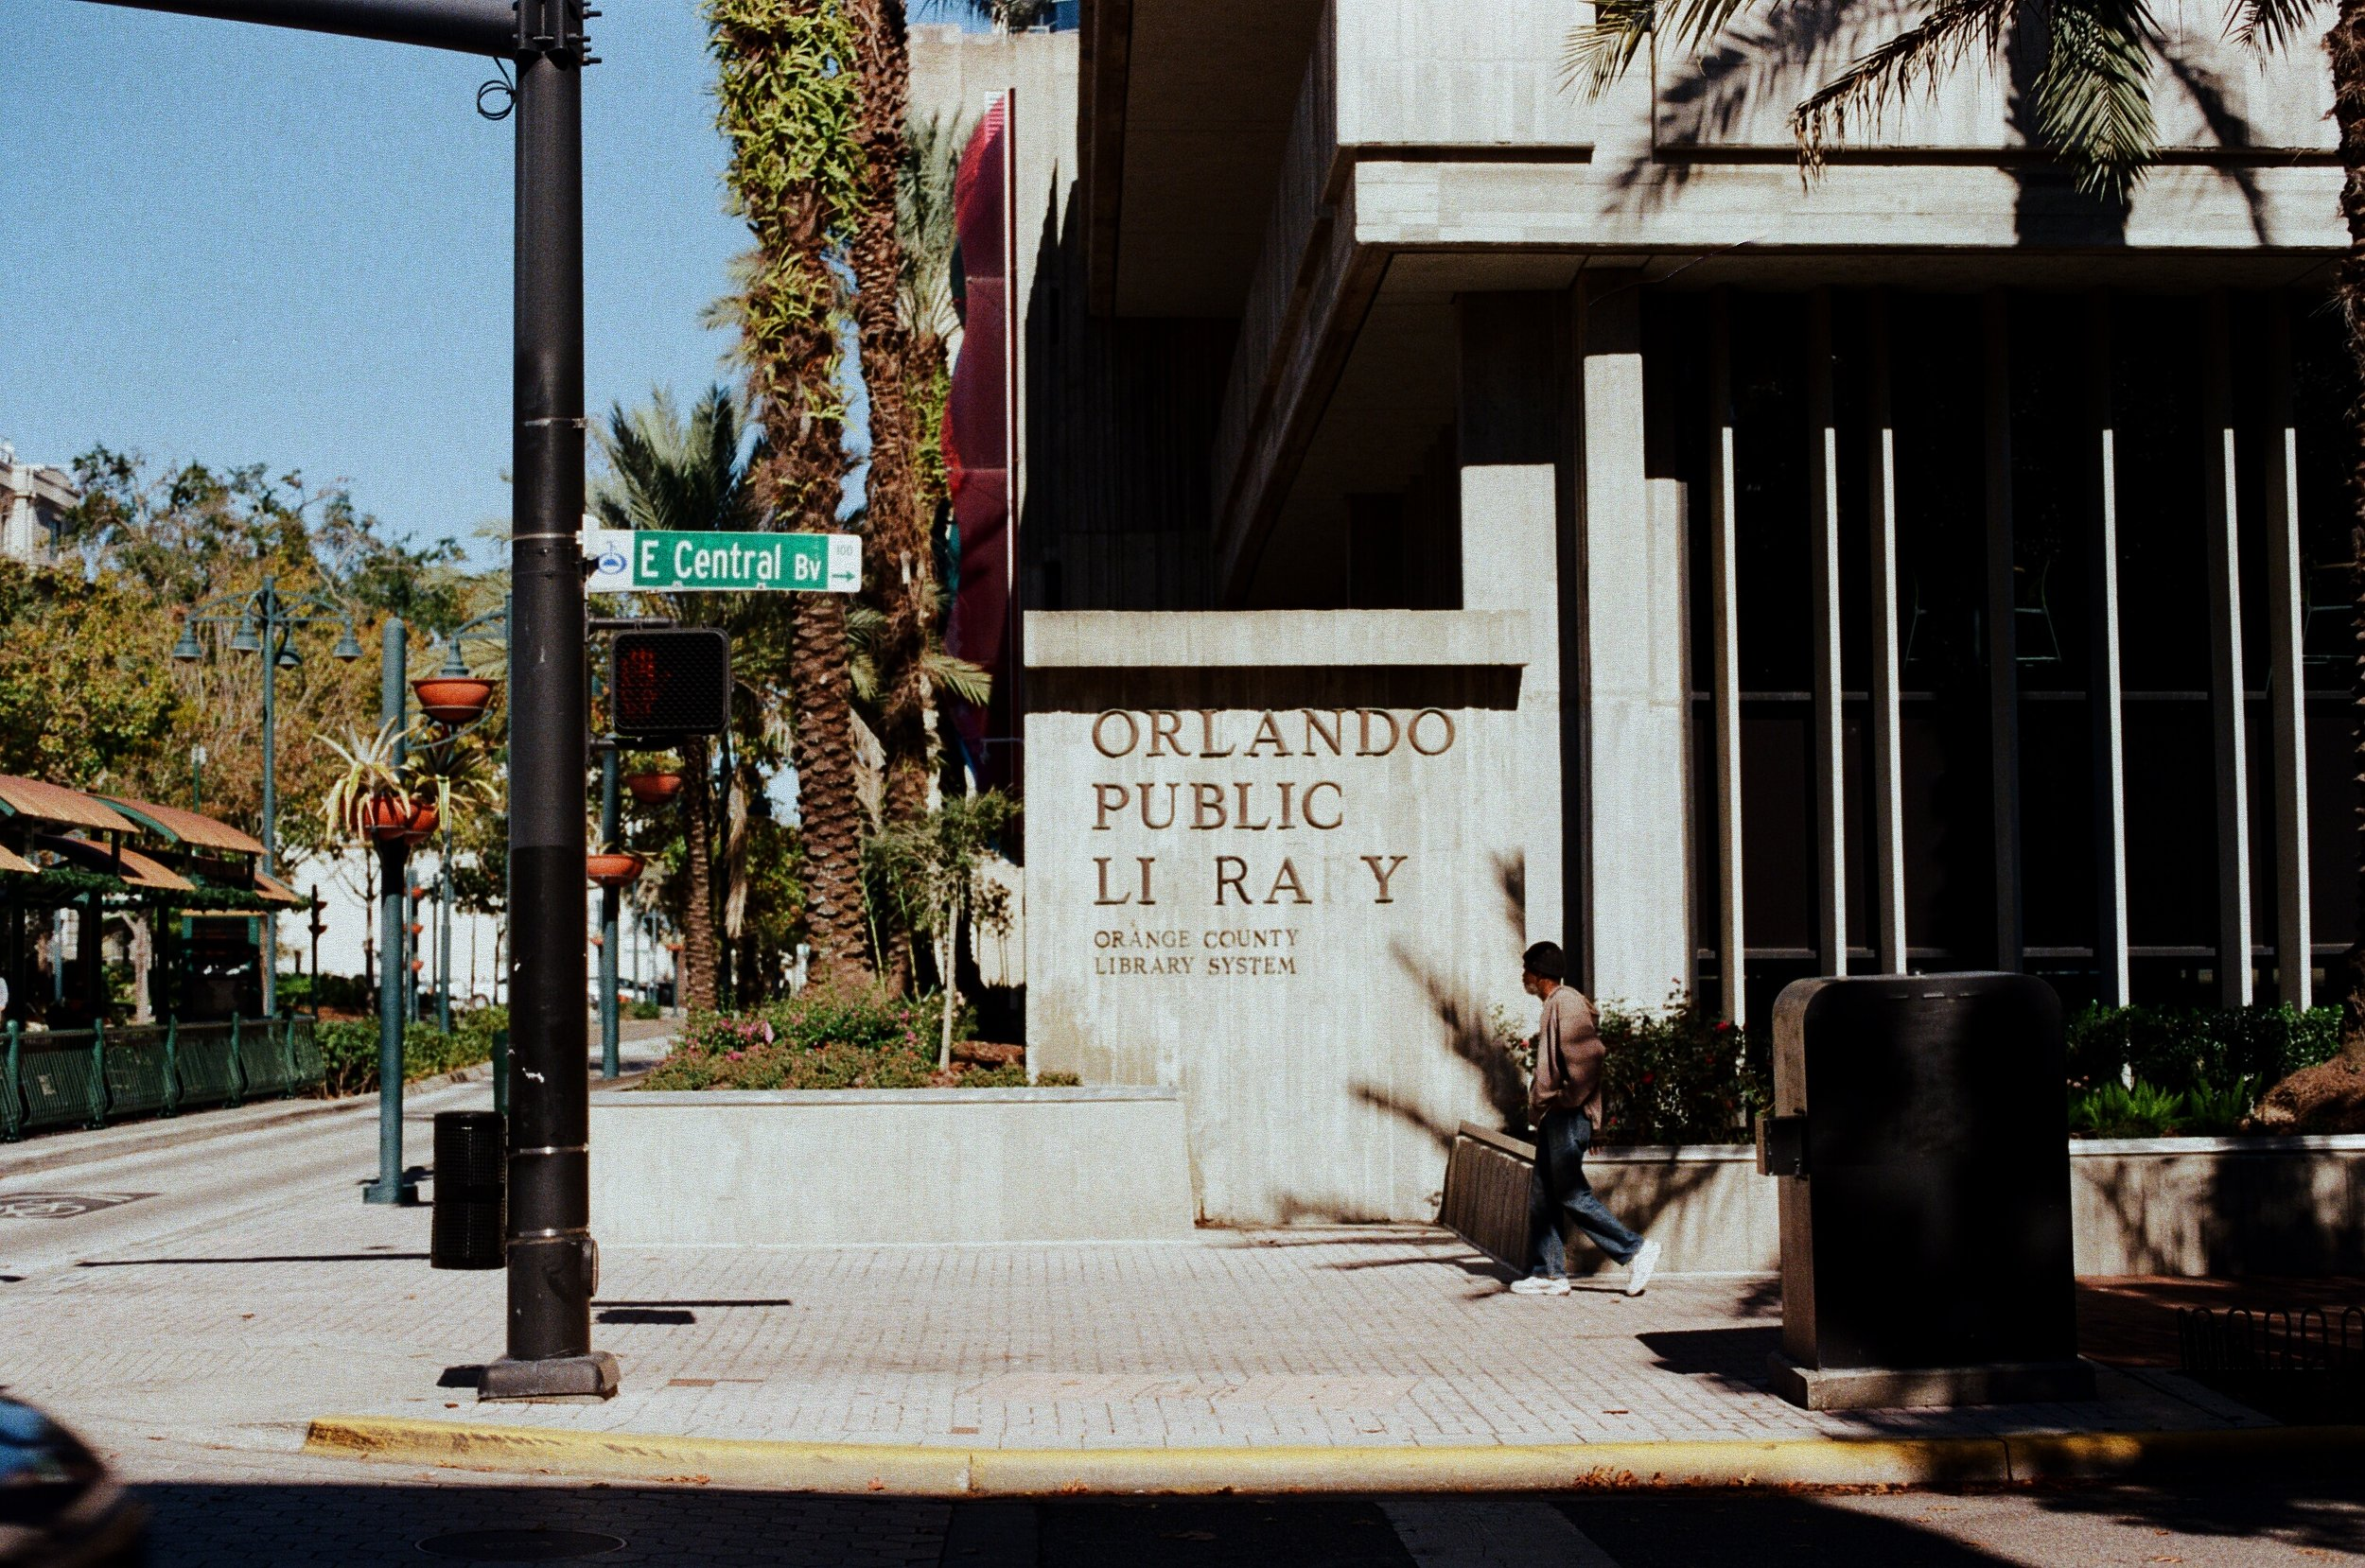 Orlando - Vol. 1 - Orlando, FL - 2019